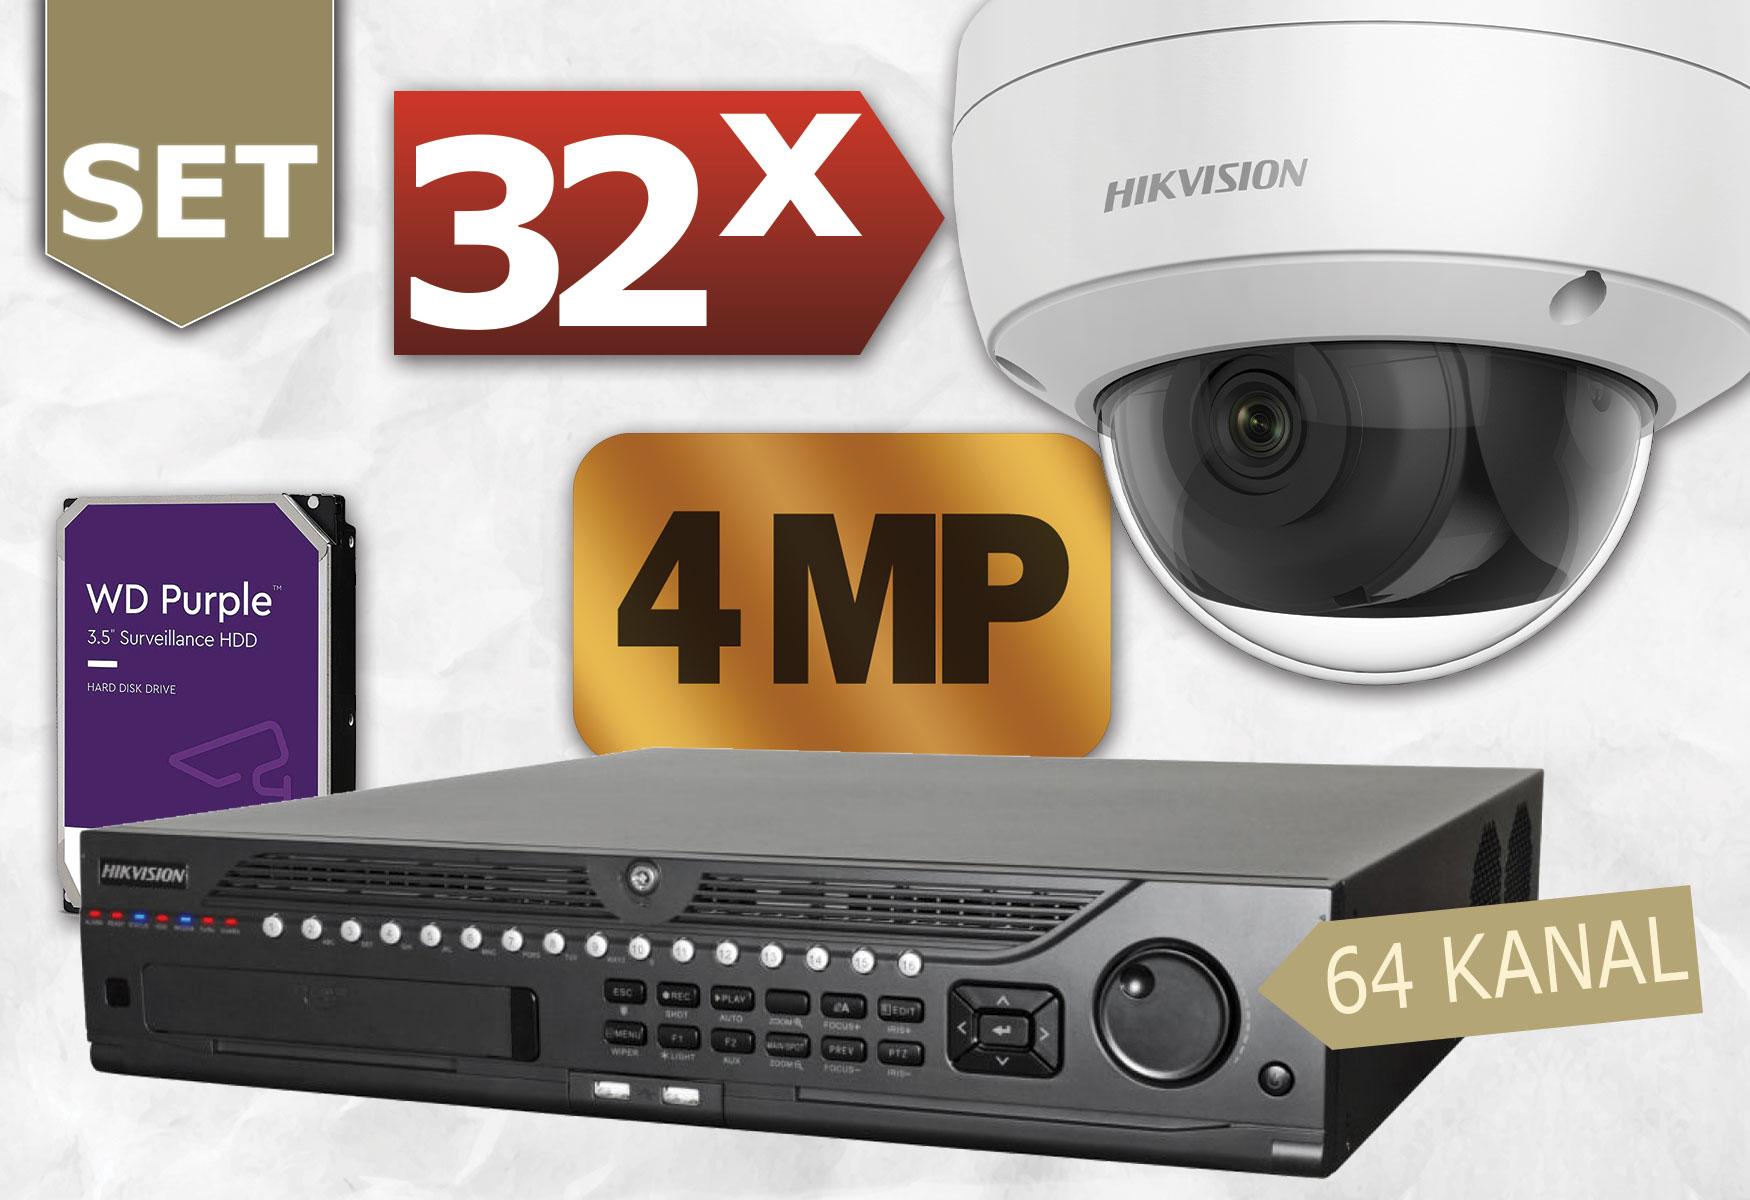 Ueberwachung-64Kanal-32x-Dome-4MP-Produkt-Grafiken-Ueberwachungskamer-Sets-ab-16-Kameras-IP.jpg